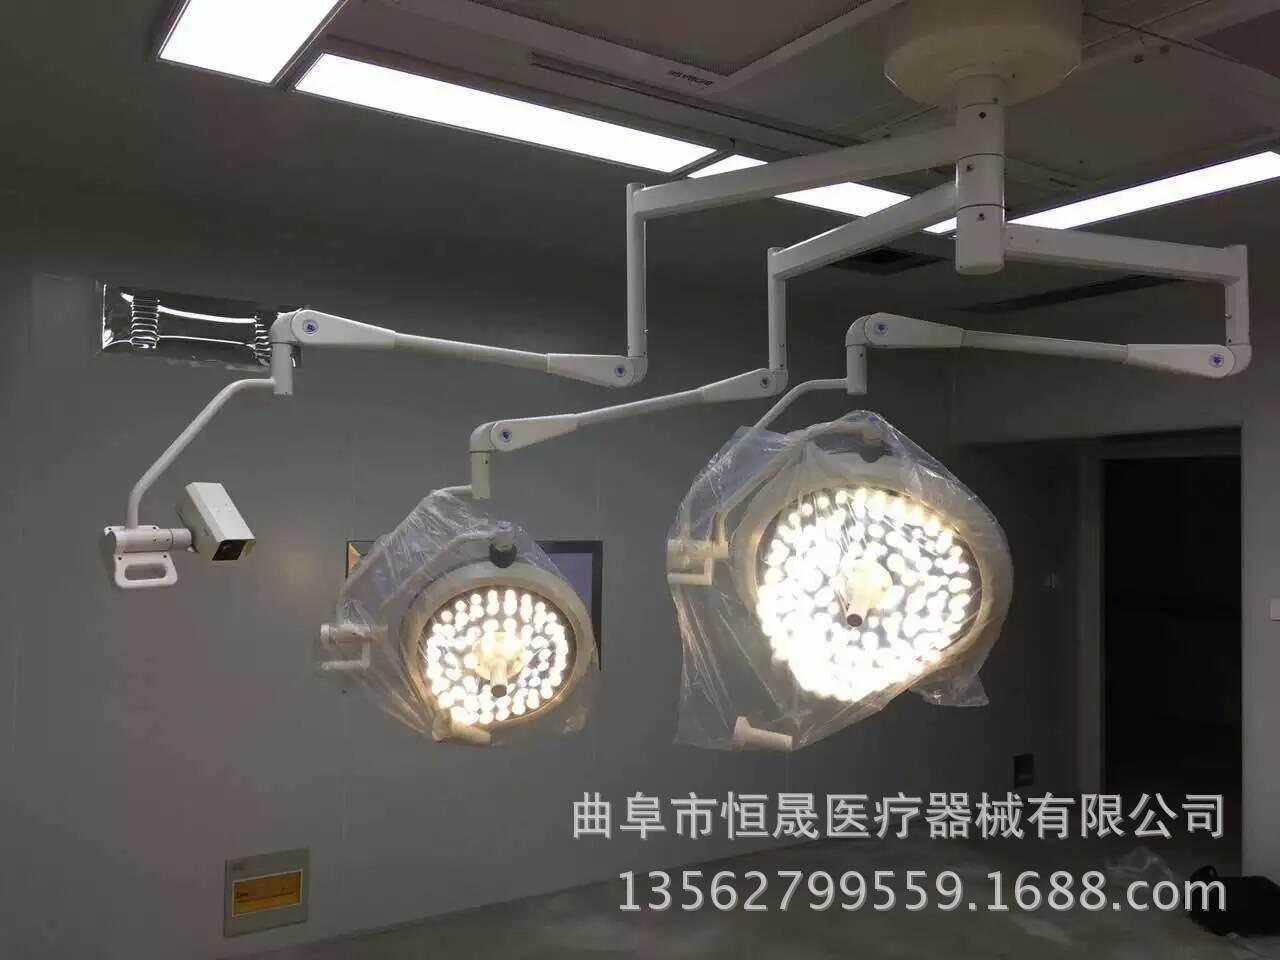 led700/500手术无影灯 手术室吊式无影灯宠物手术灯医用